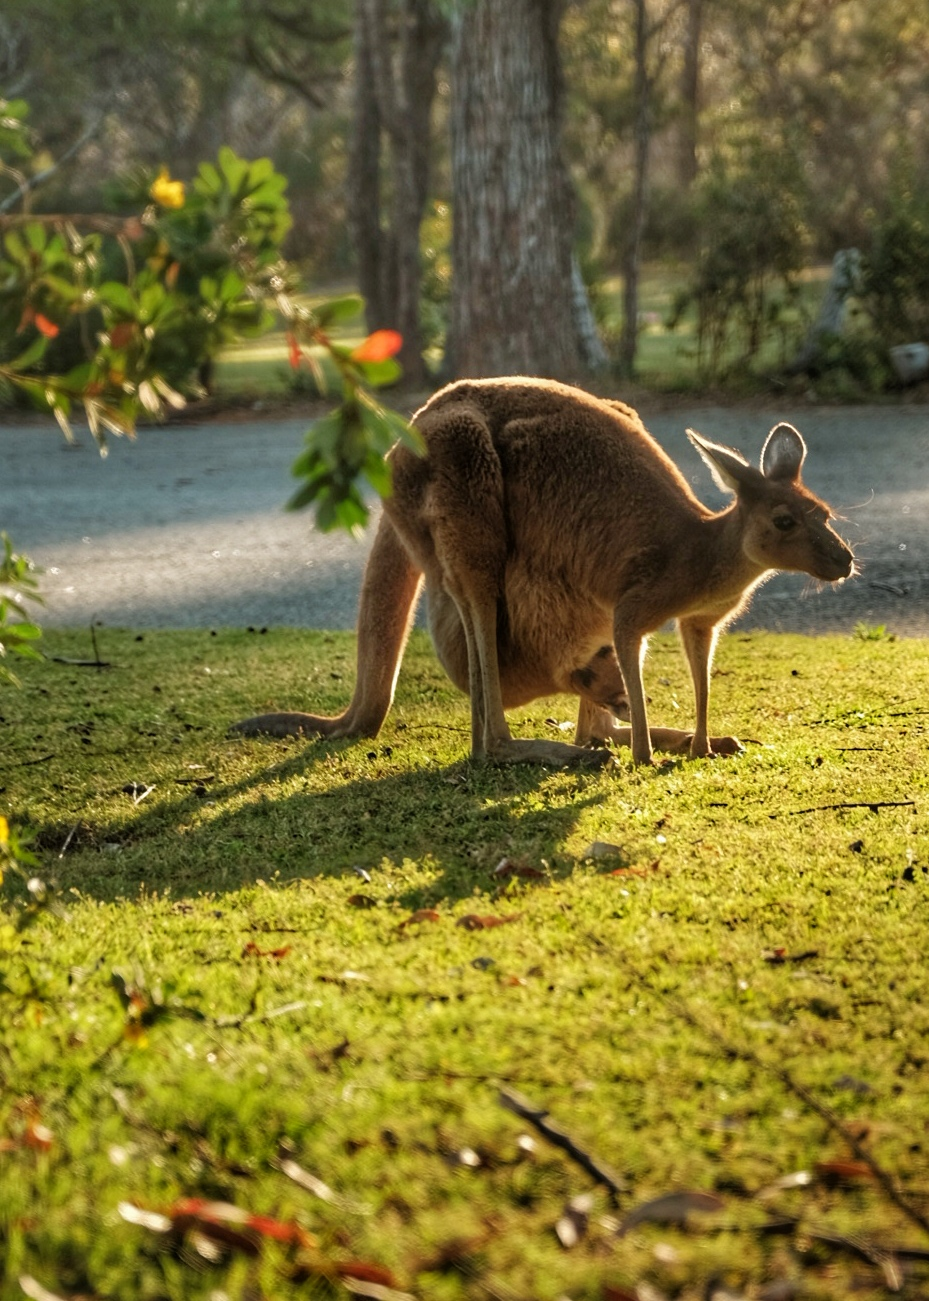 Kangaroo at Pinnaroo Cemetery.